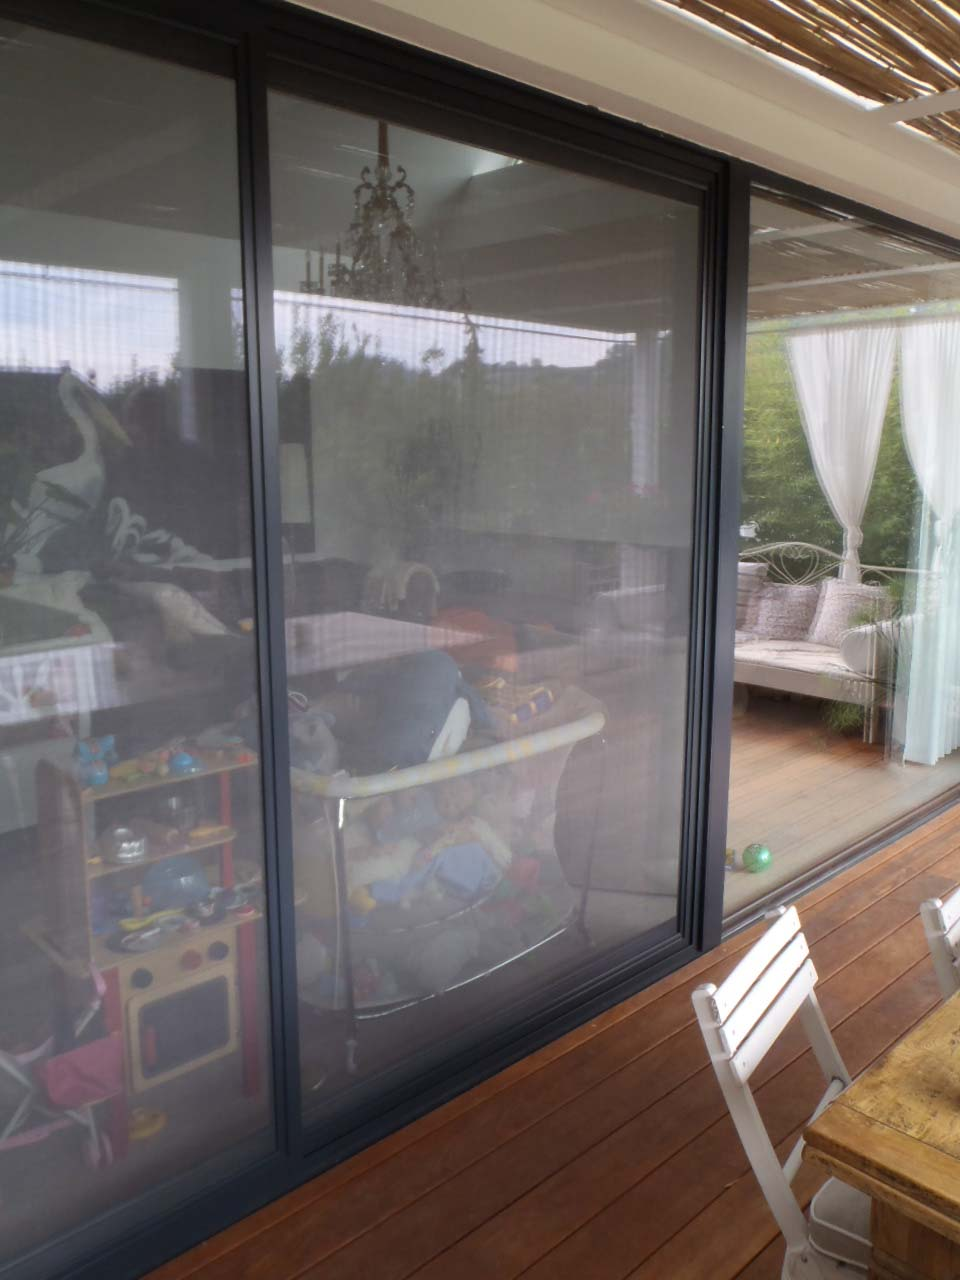 insektenschutzgitter hanko shop. Black Bedroom Furniture Sets. Home Design Ideas